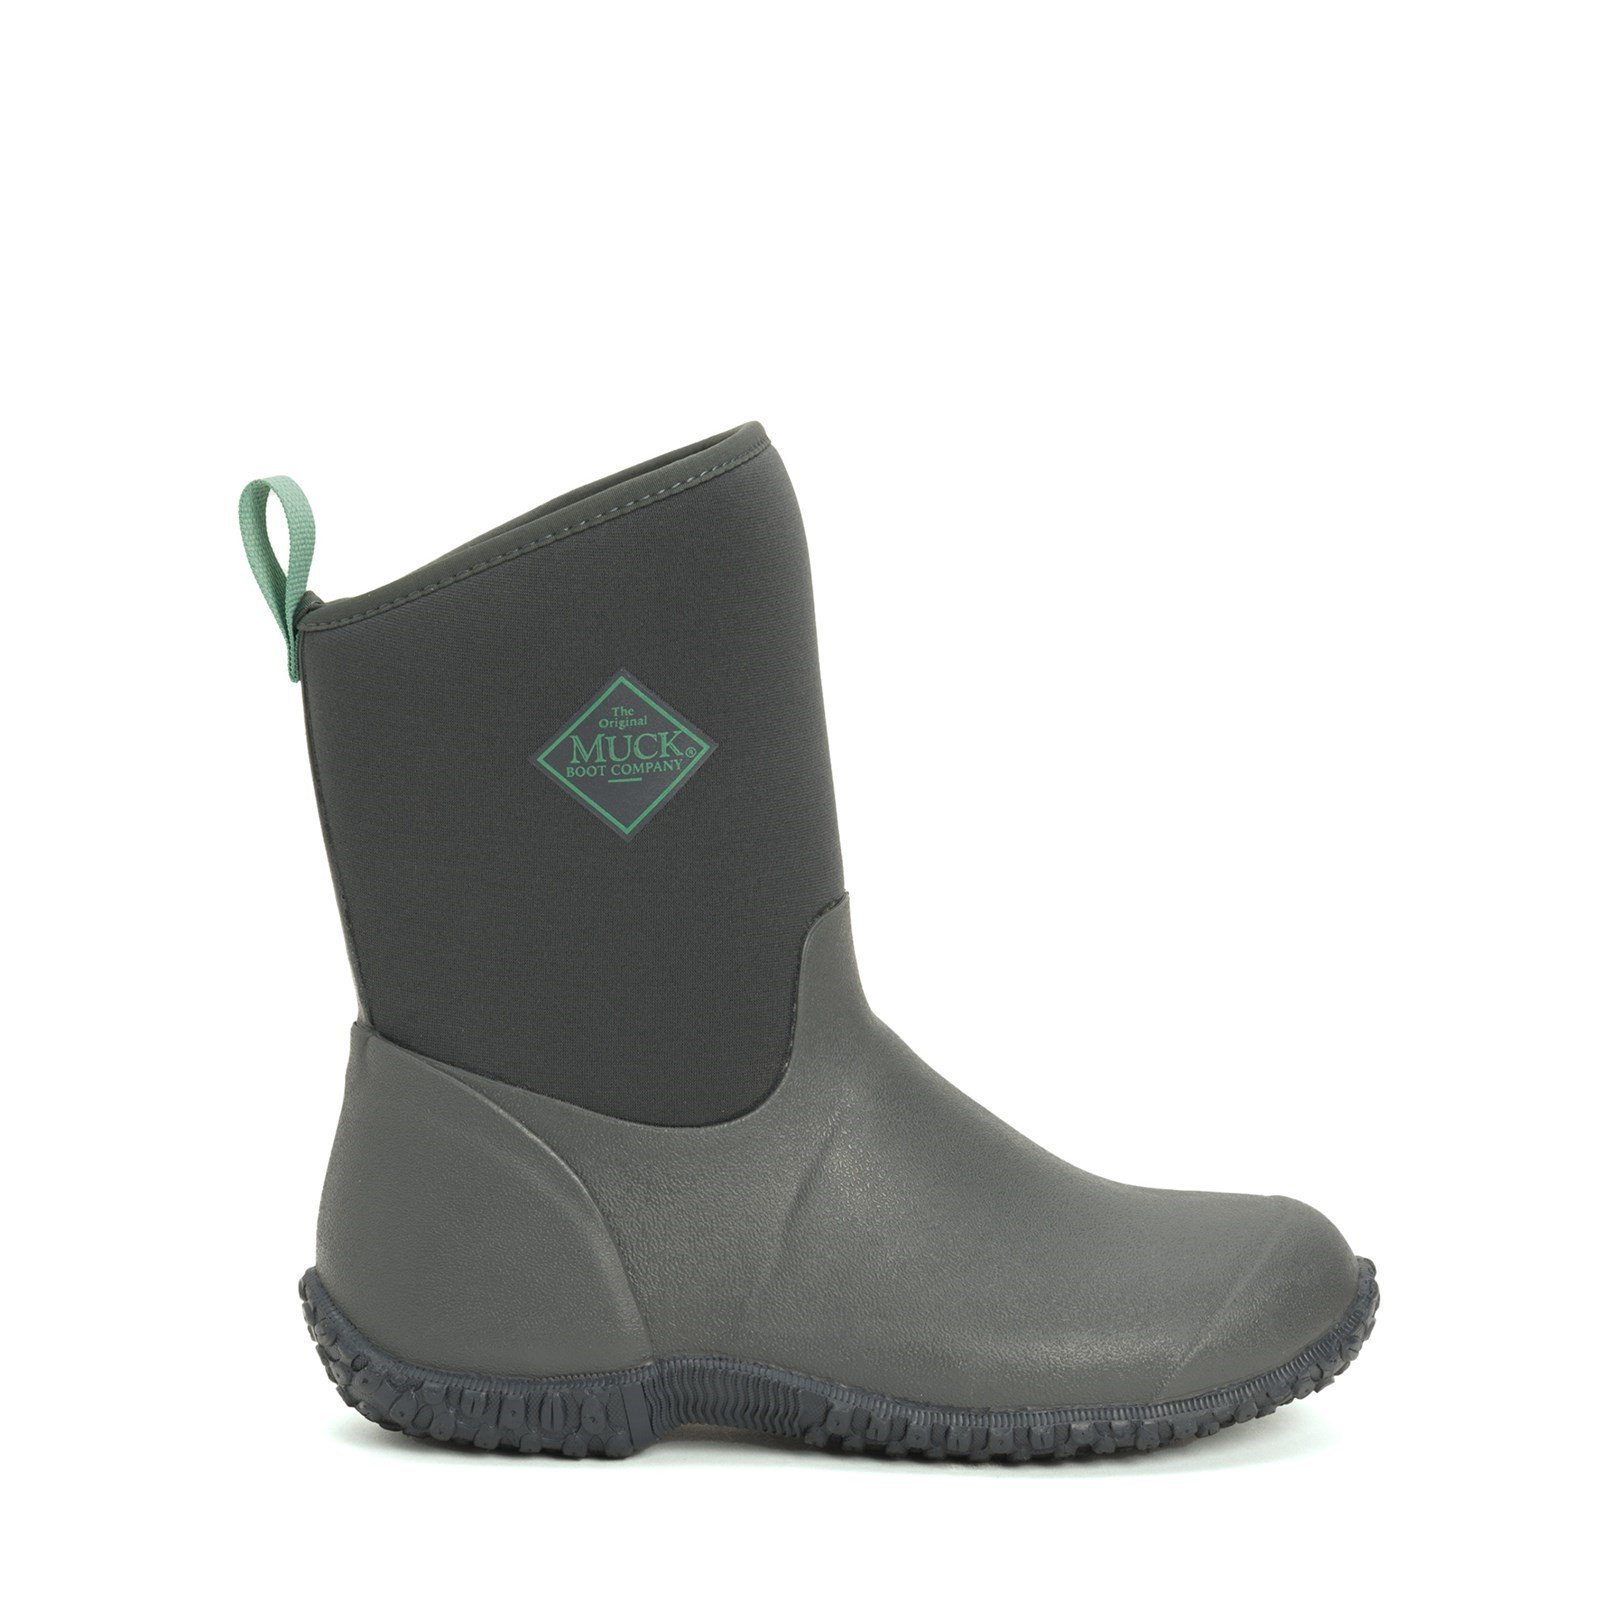 Muck Boots Women's Muckster II Slip On Short Boot Multicolor 28899 - Grey/Print 8